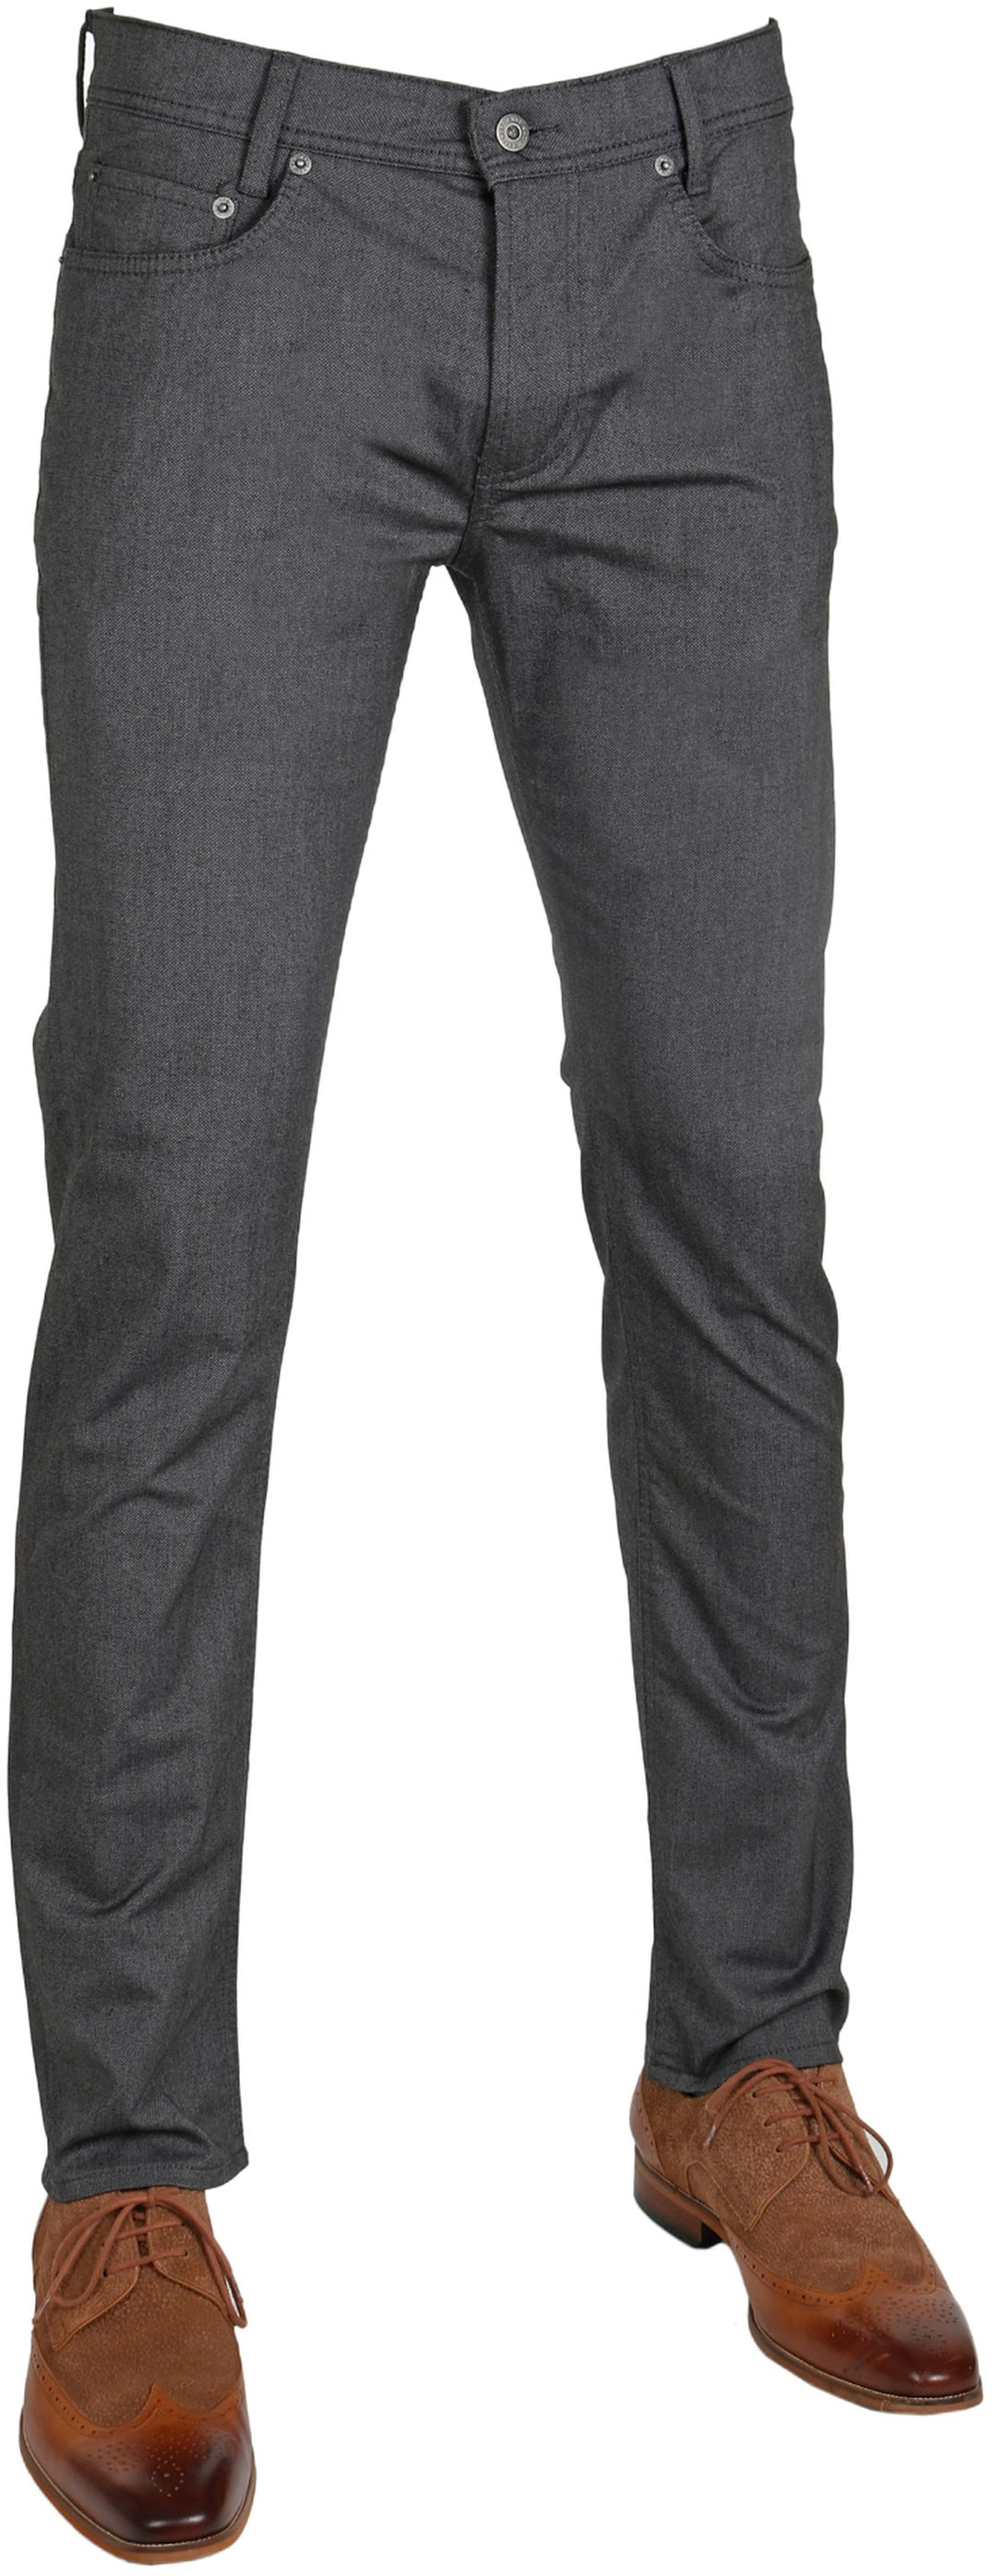 mac jeans arne pipe antraciet online bestellen suitable. Black Bedroom Furniture Sets. Home Design Ideas